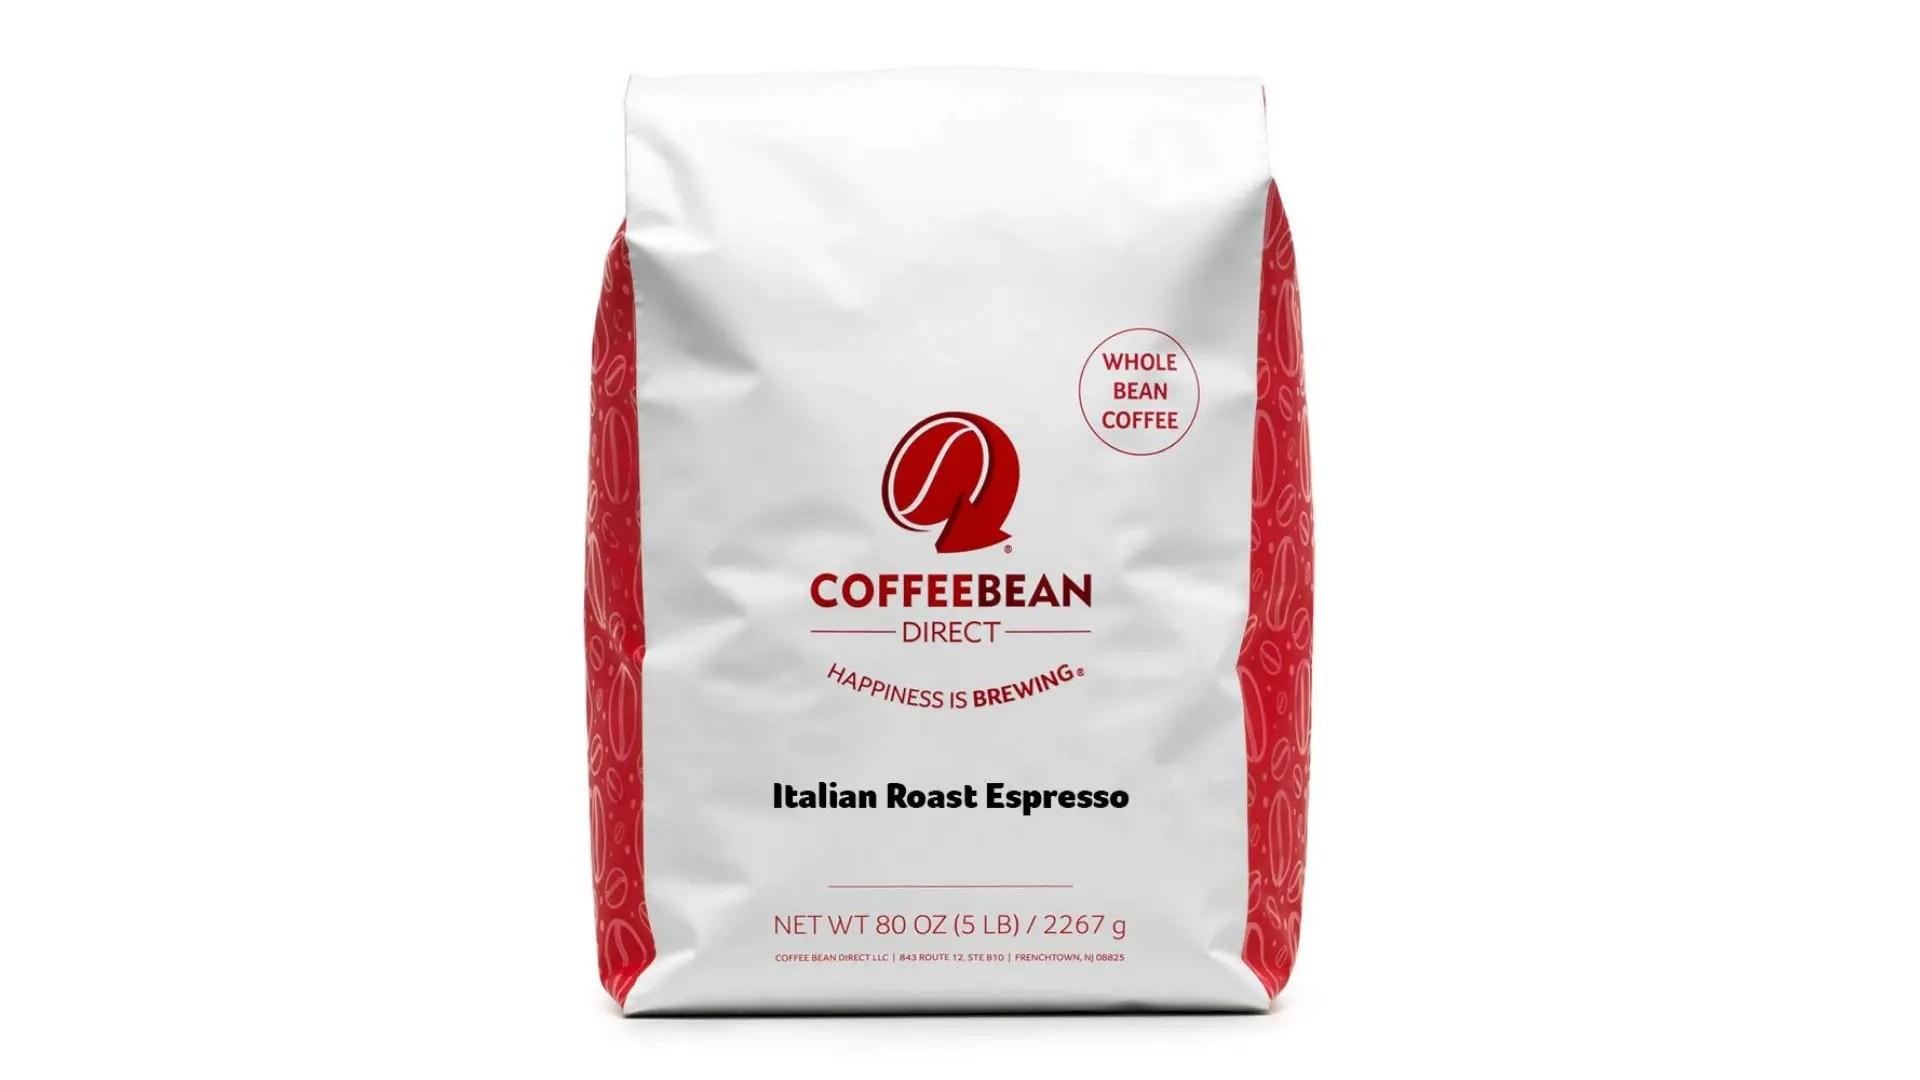 CoffeeBean Direct Italian Roast Espresso